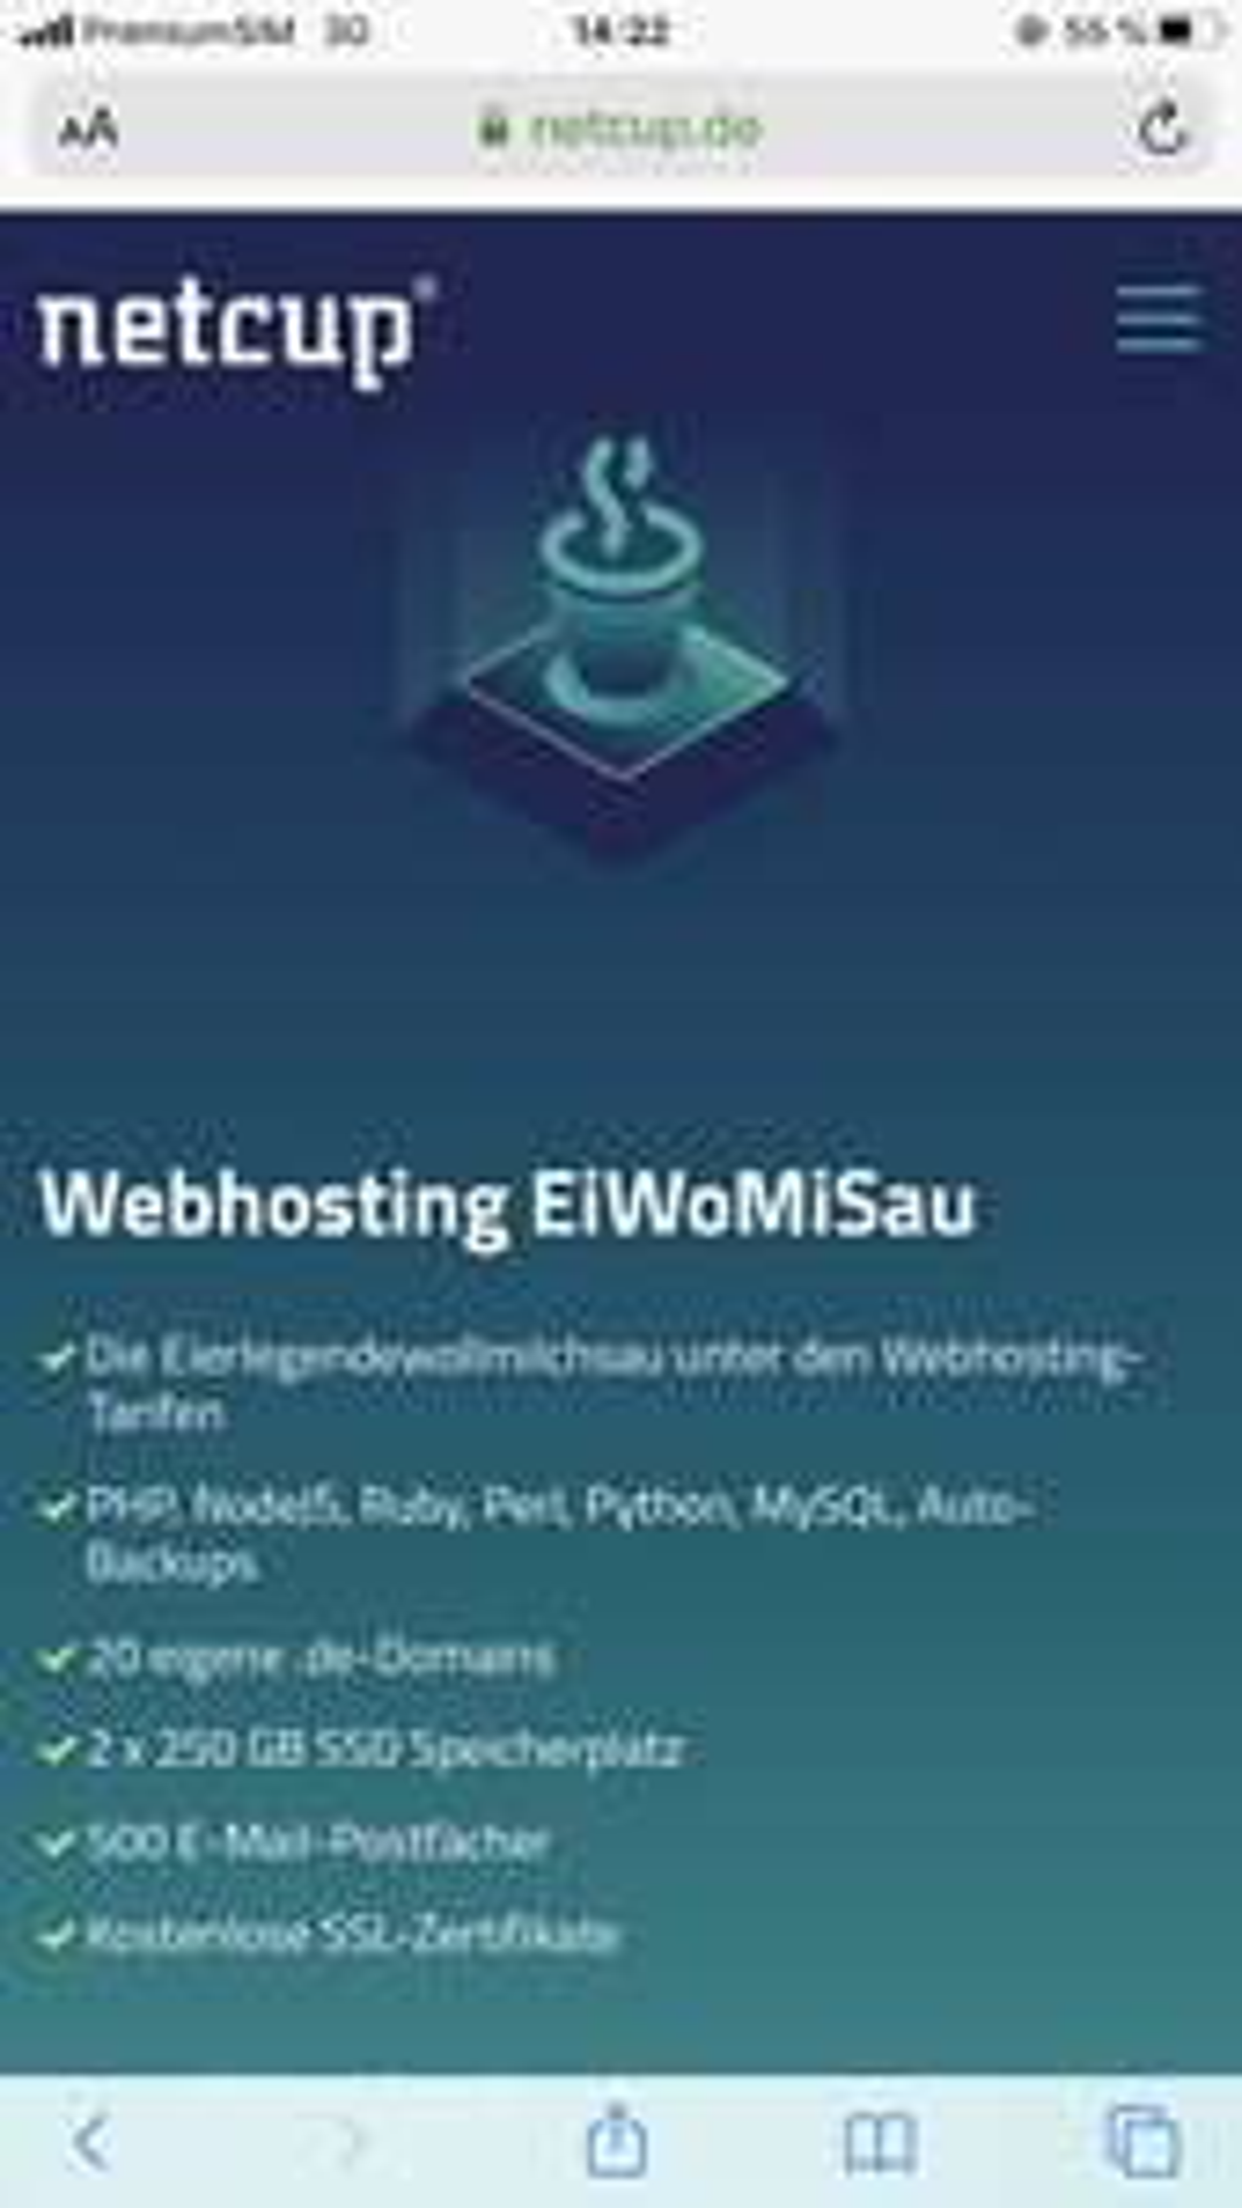 [netcup.de] EiWoMiSau Webhosting für 4,76€ / Monat • 20 .de Domain • 2x 250GB SSD Speicher • SSL • 500 Datenbanken • unlimited Traffic